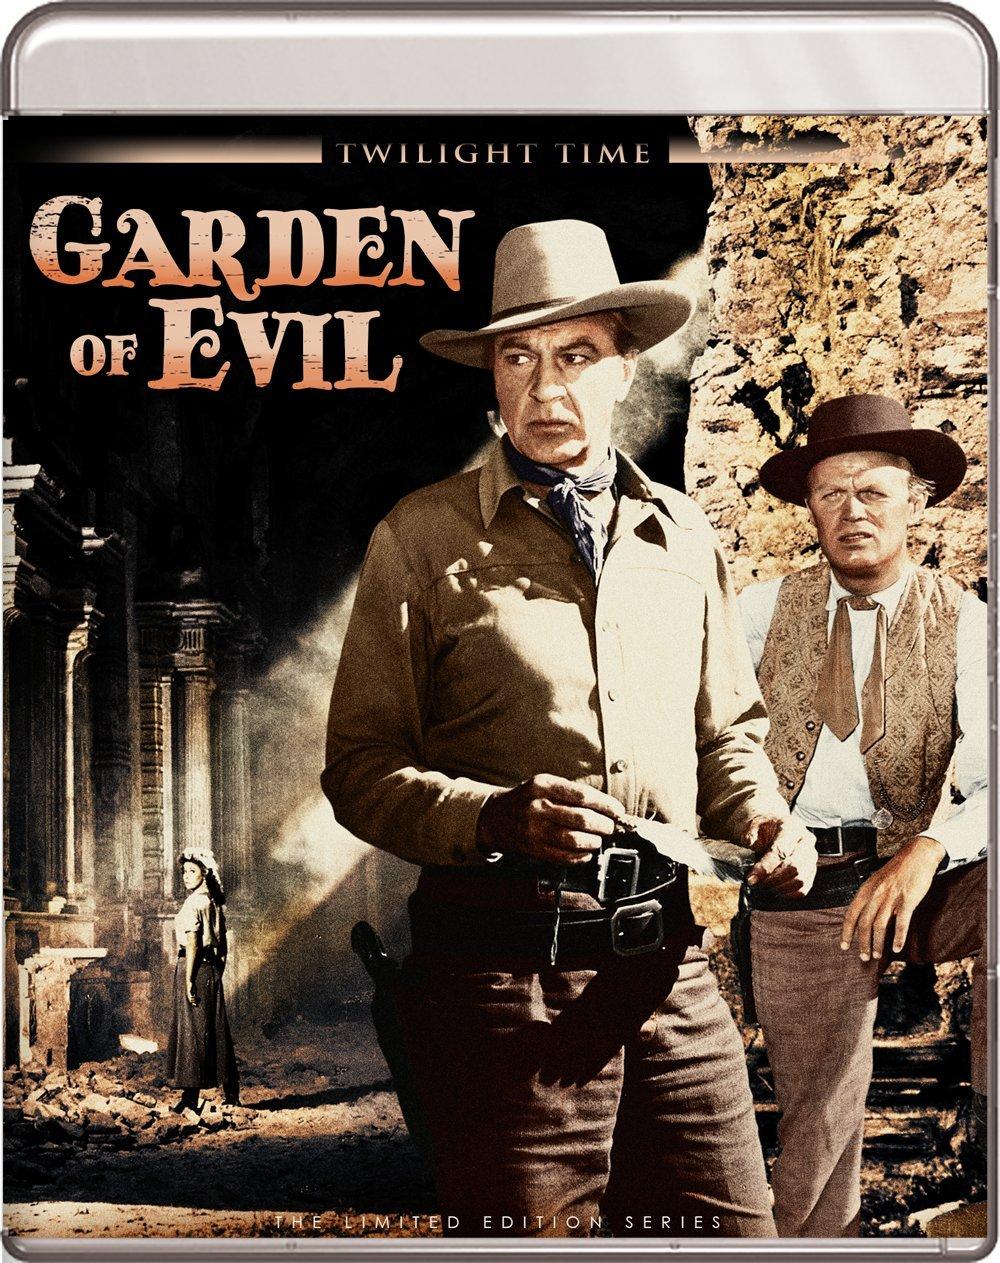 Amazon.com: Garden of Evil: Gary Cooper, Susan Hayward, Richard ...